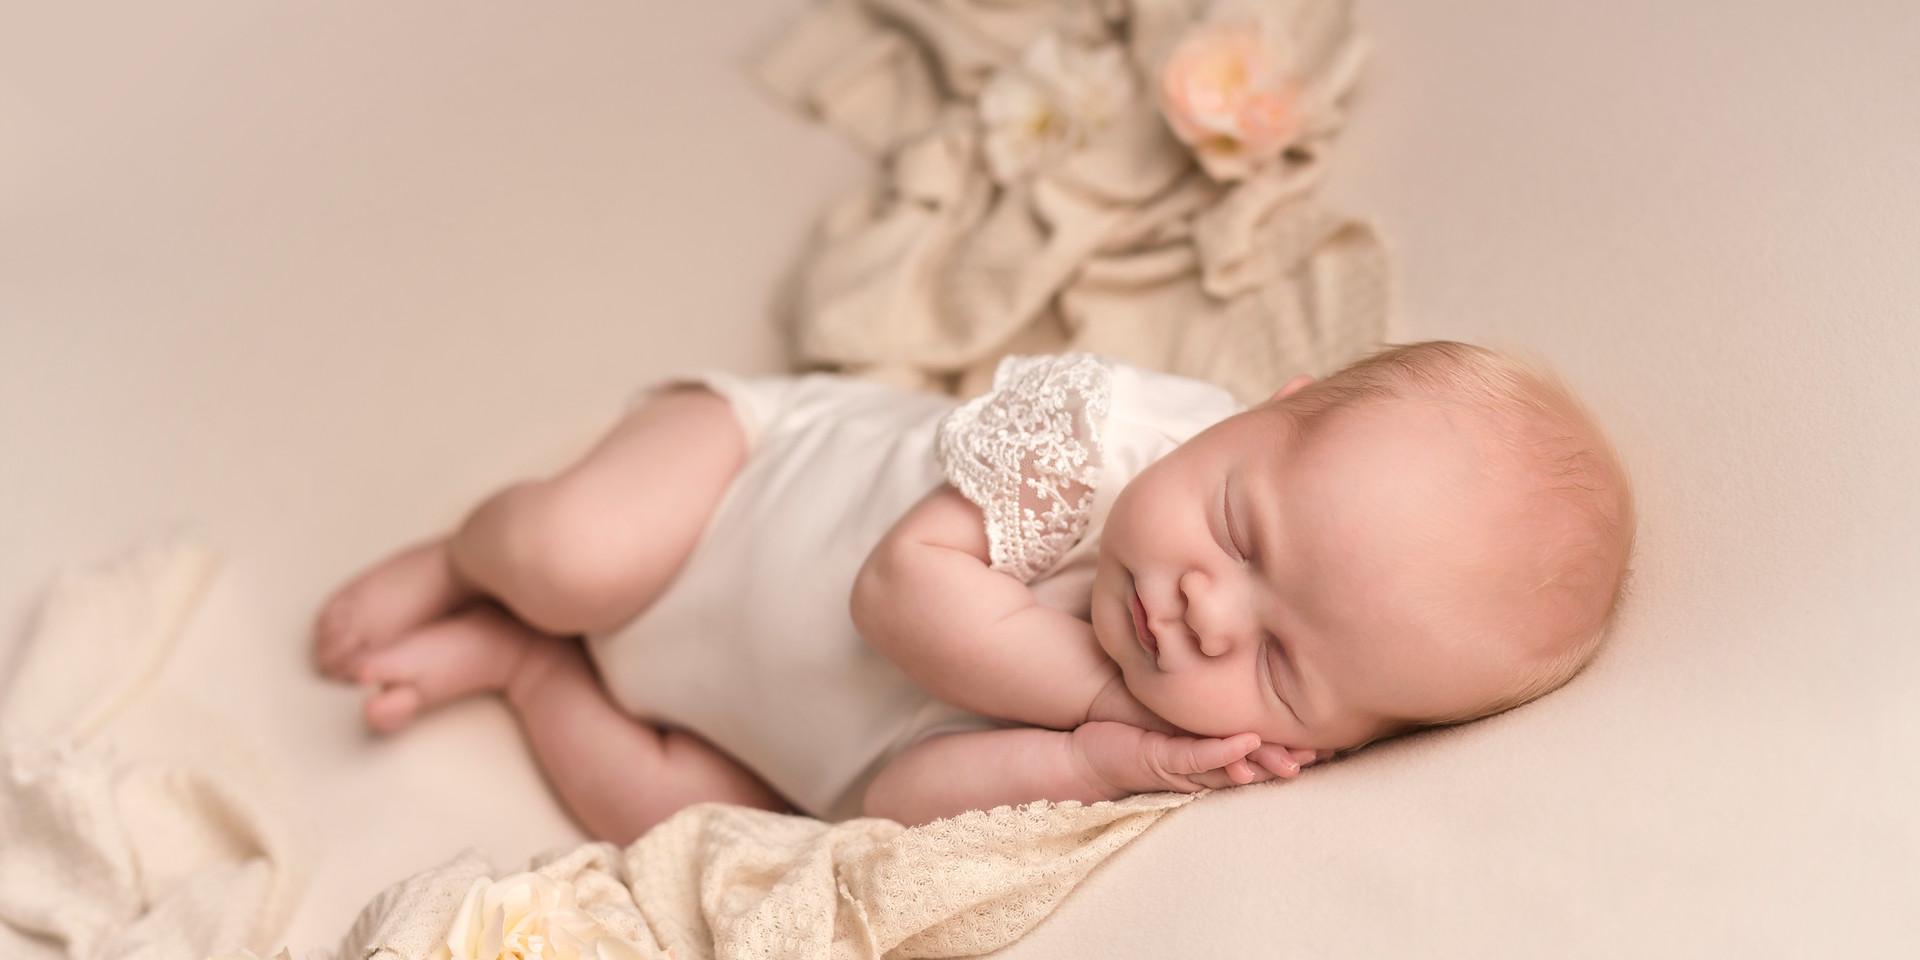 dunedin baby photographer roses.jpg